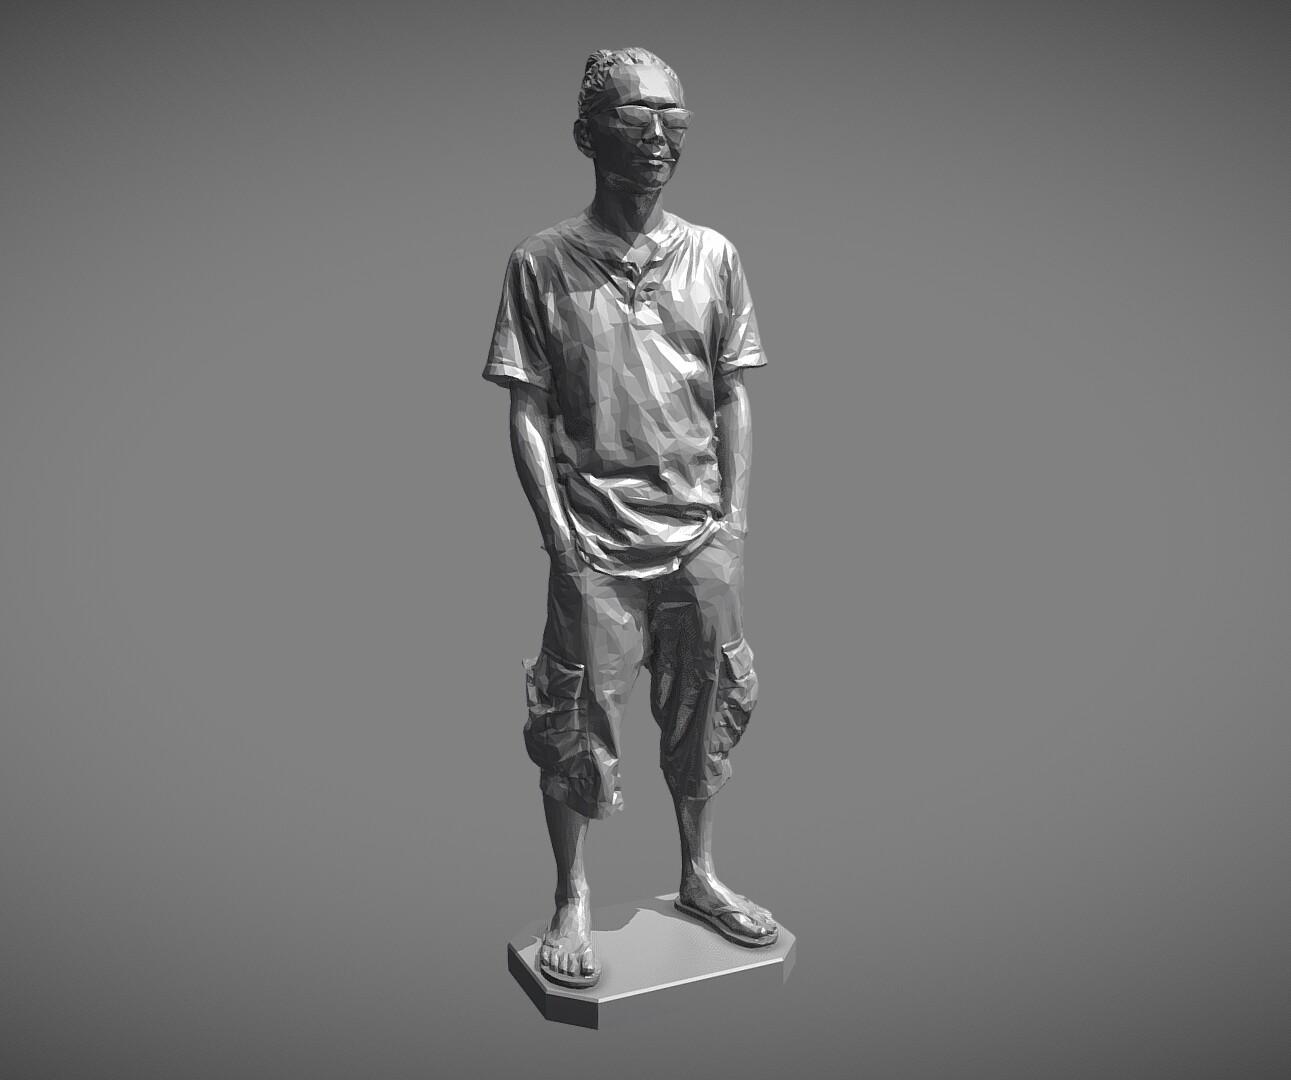 Michael wu 3d models by mwopus mwopus sketchfab20190320 007955